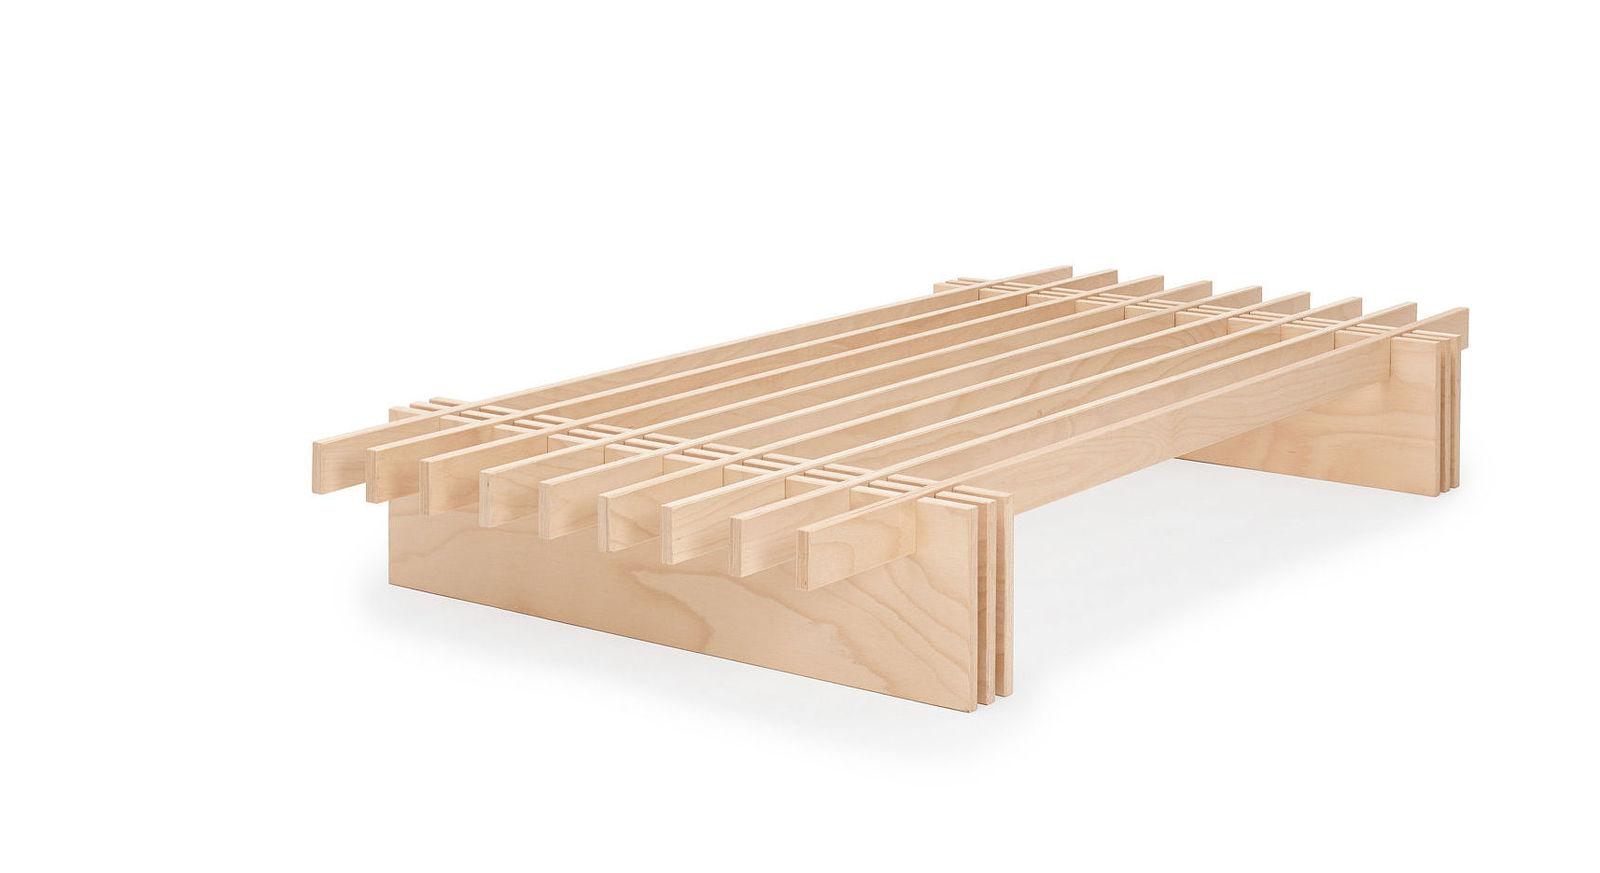 Bettsystem Tojo Parallel in Einzelbett-Größe